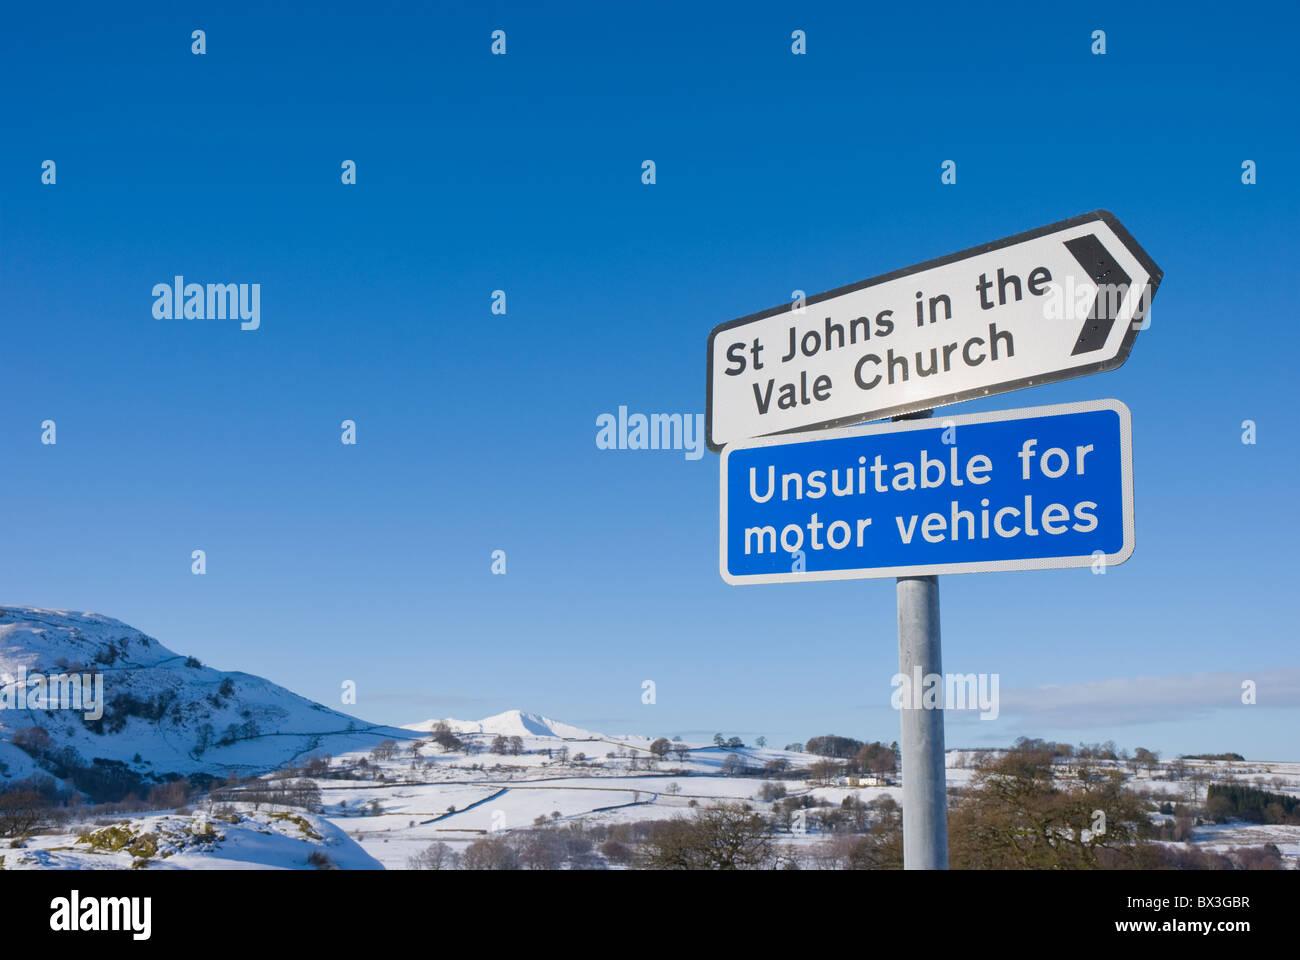 Roadsign for unsuitable road, near Keswick, Lake District, Cumbria - Stock Image